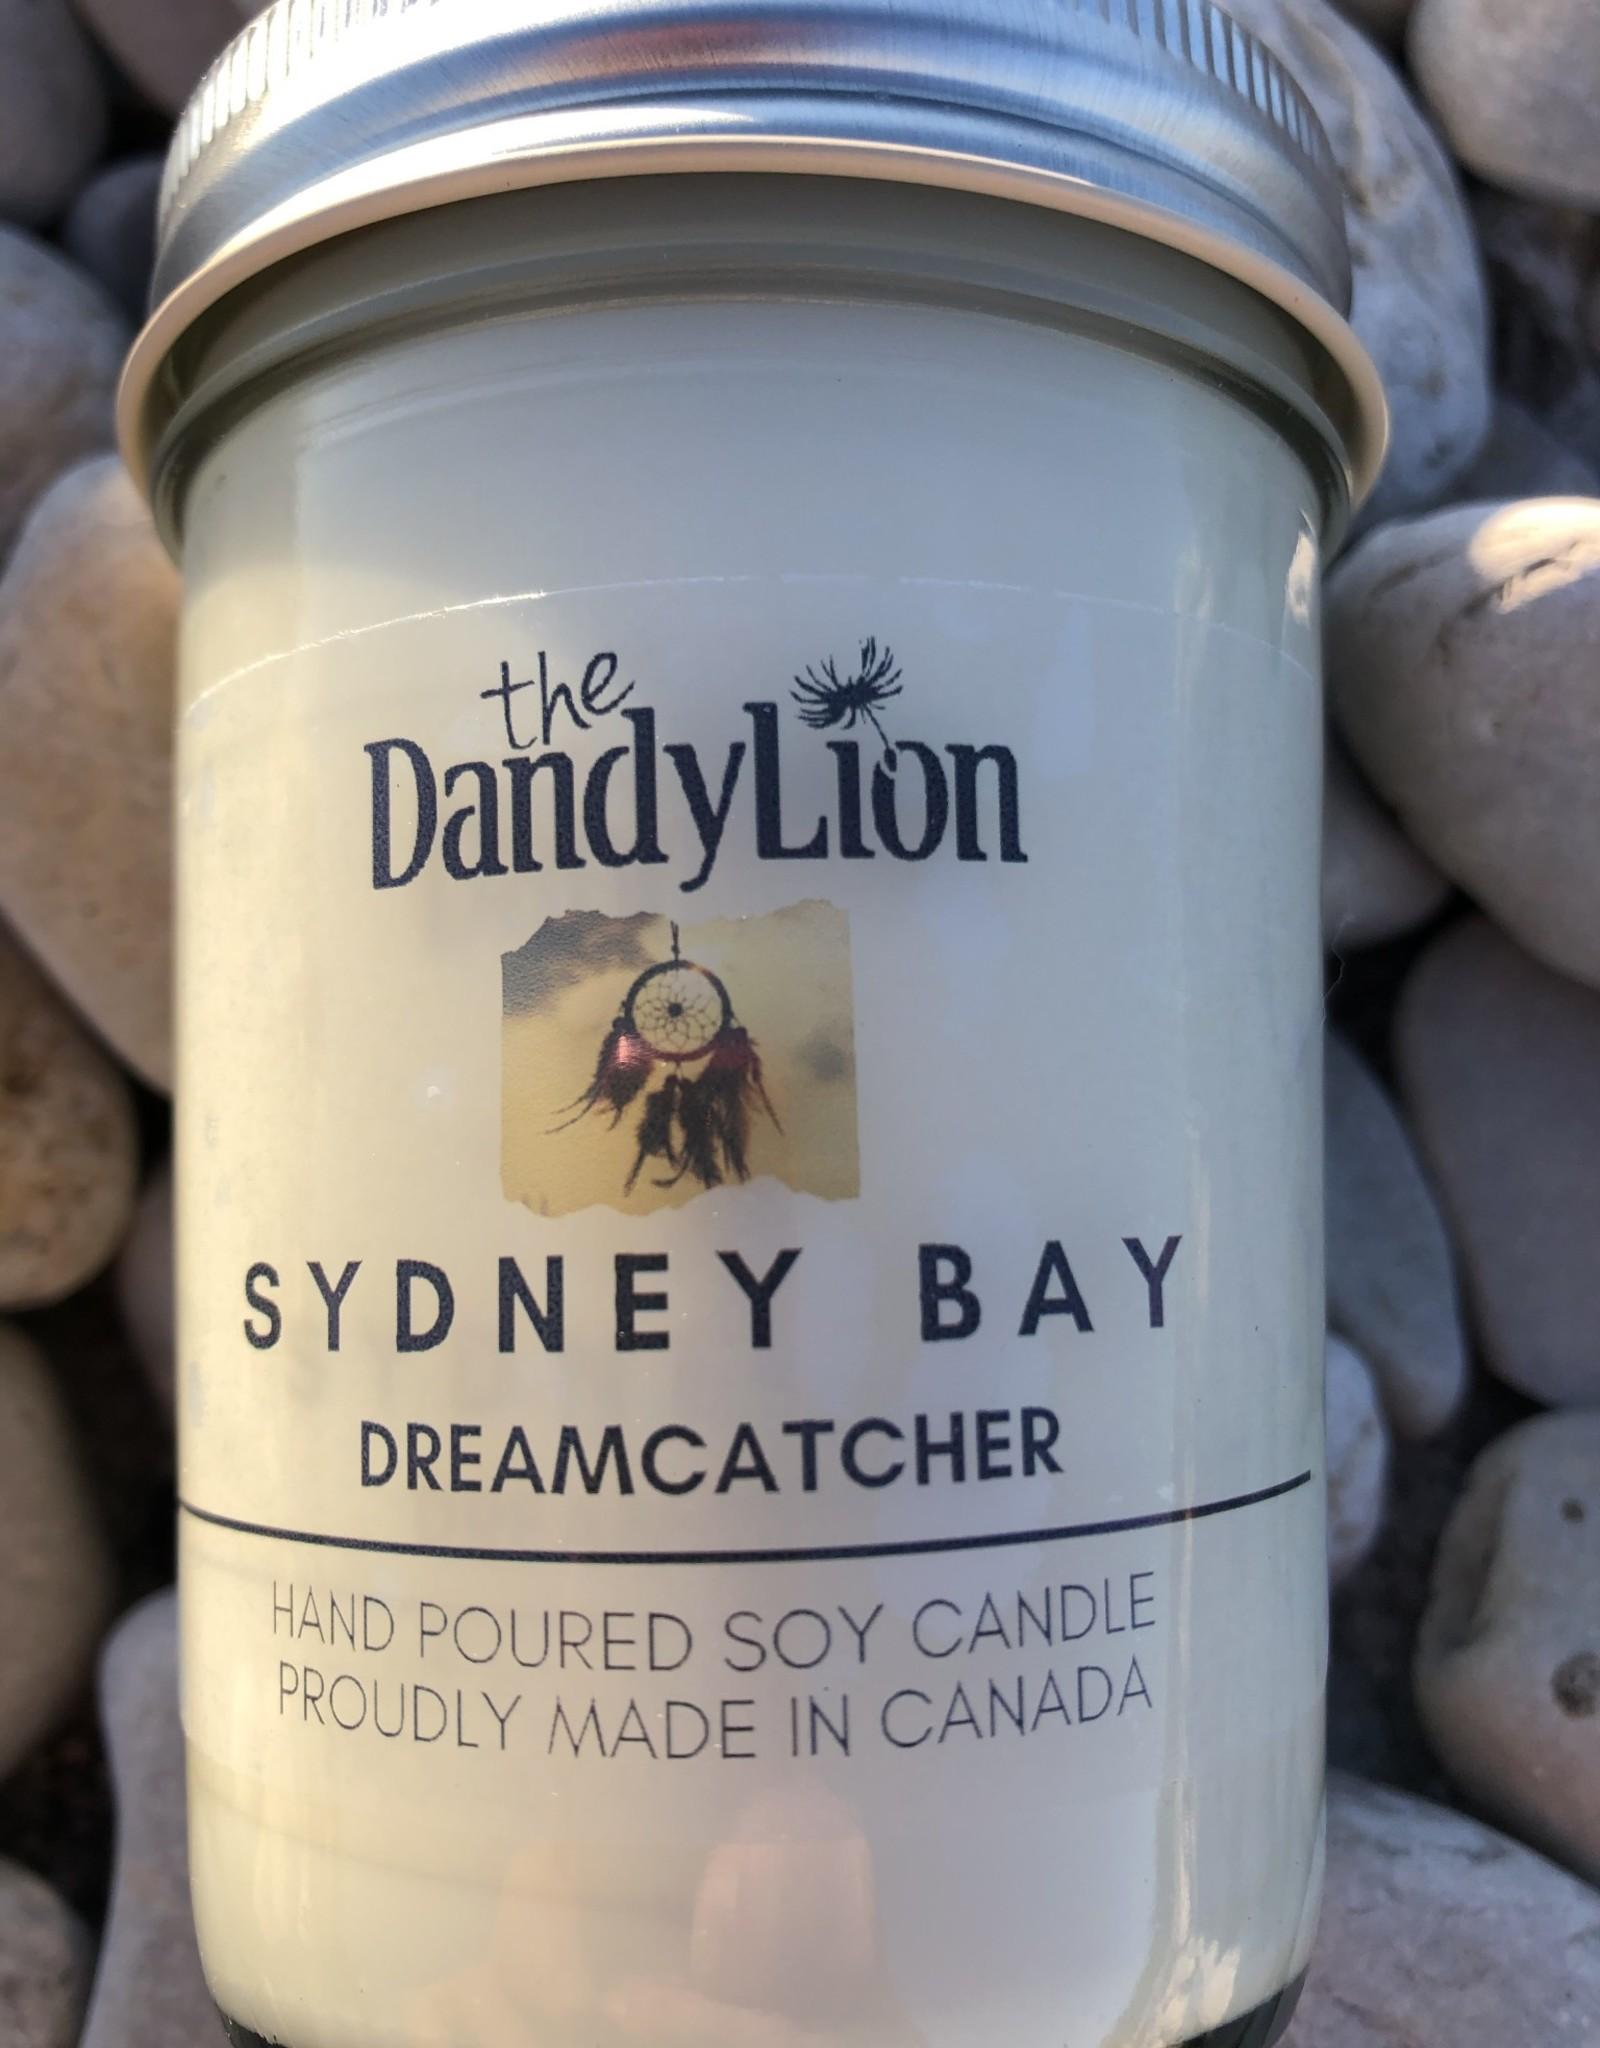 serendipity Sydney Bay 8 oz soy candle